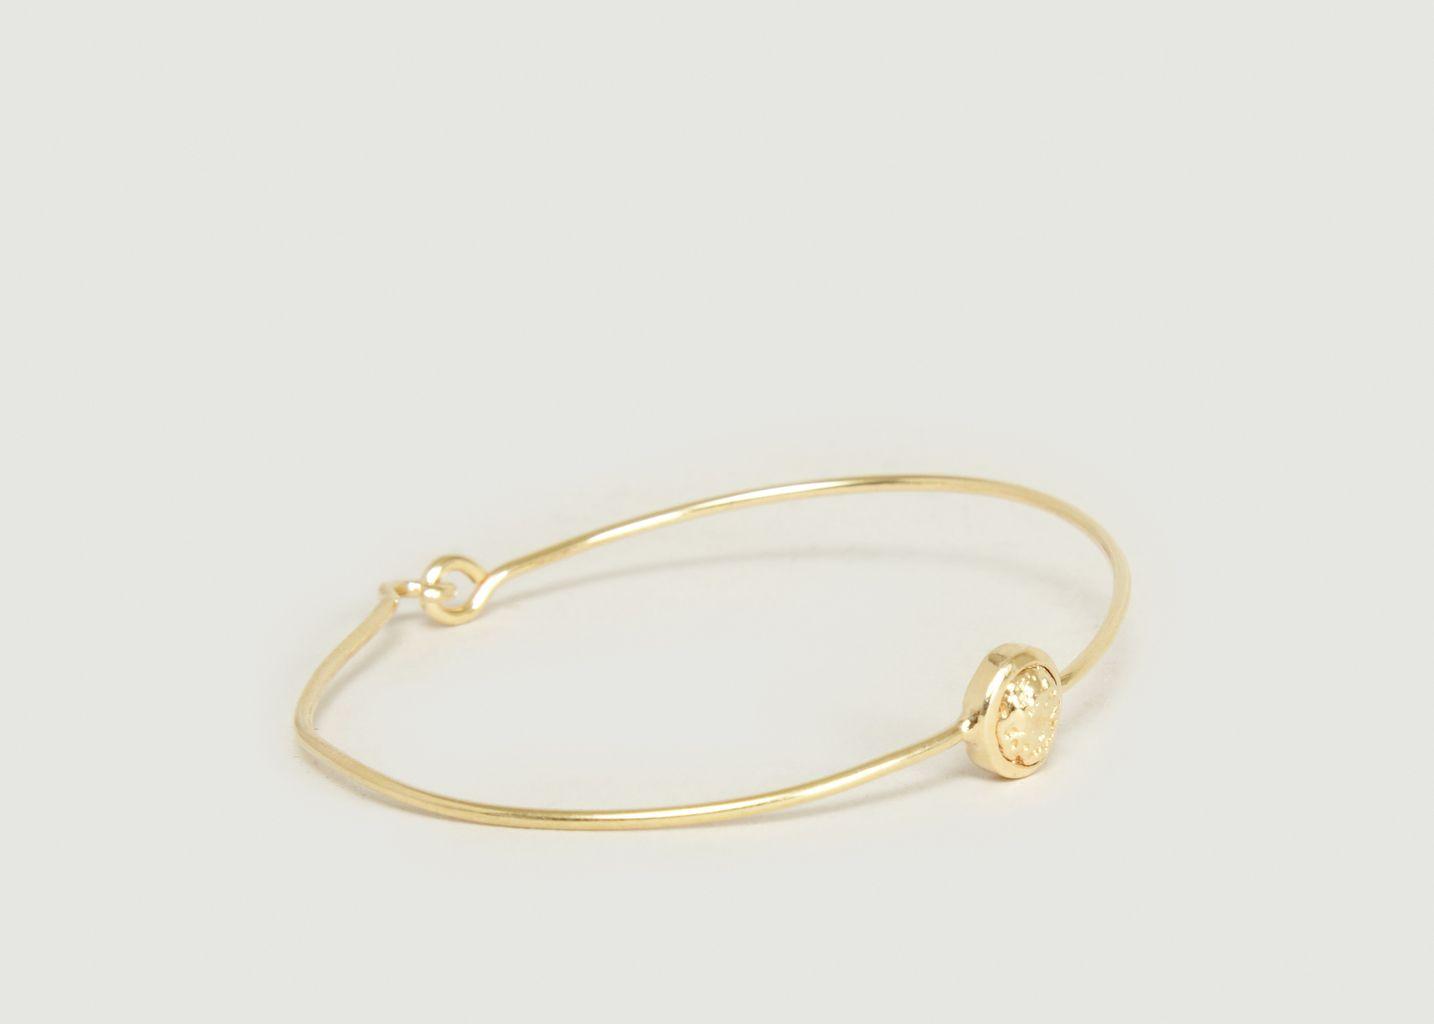 Bracelet Fin Marius - Monsieur